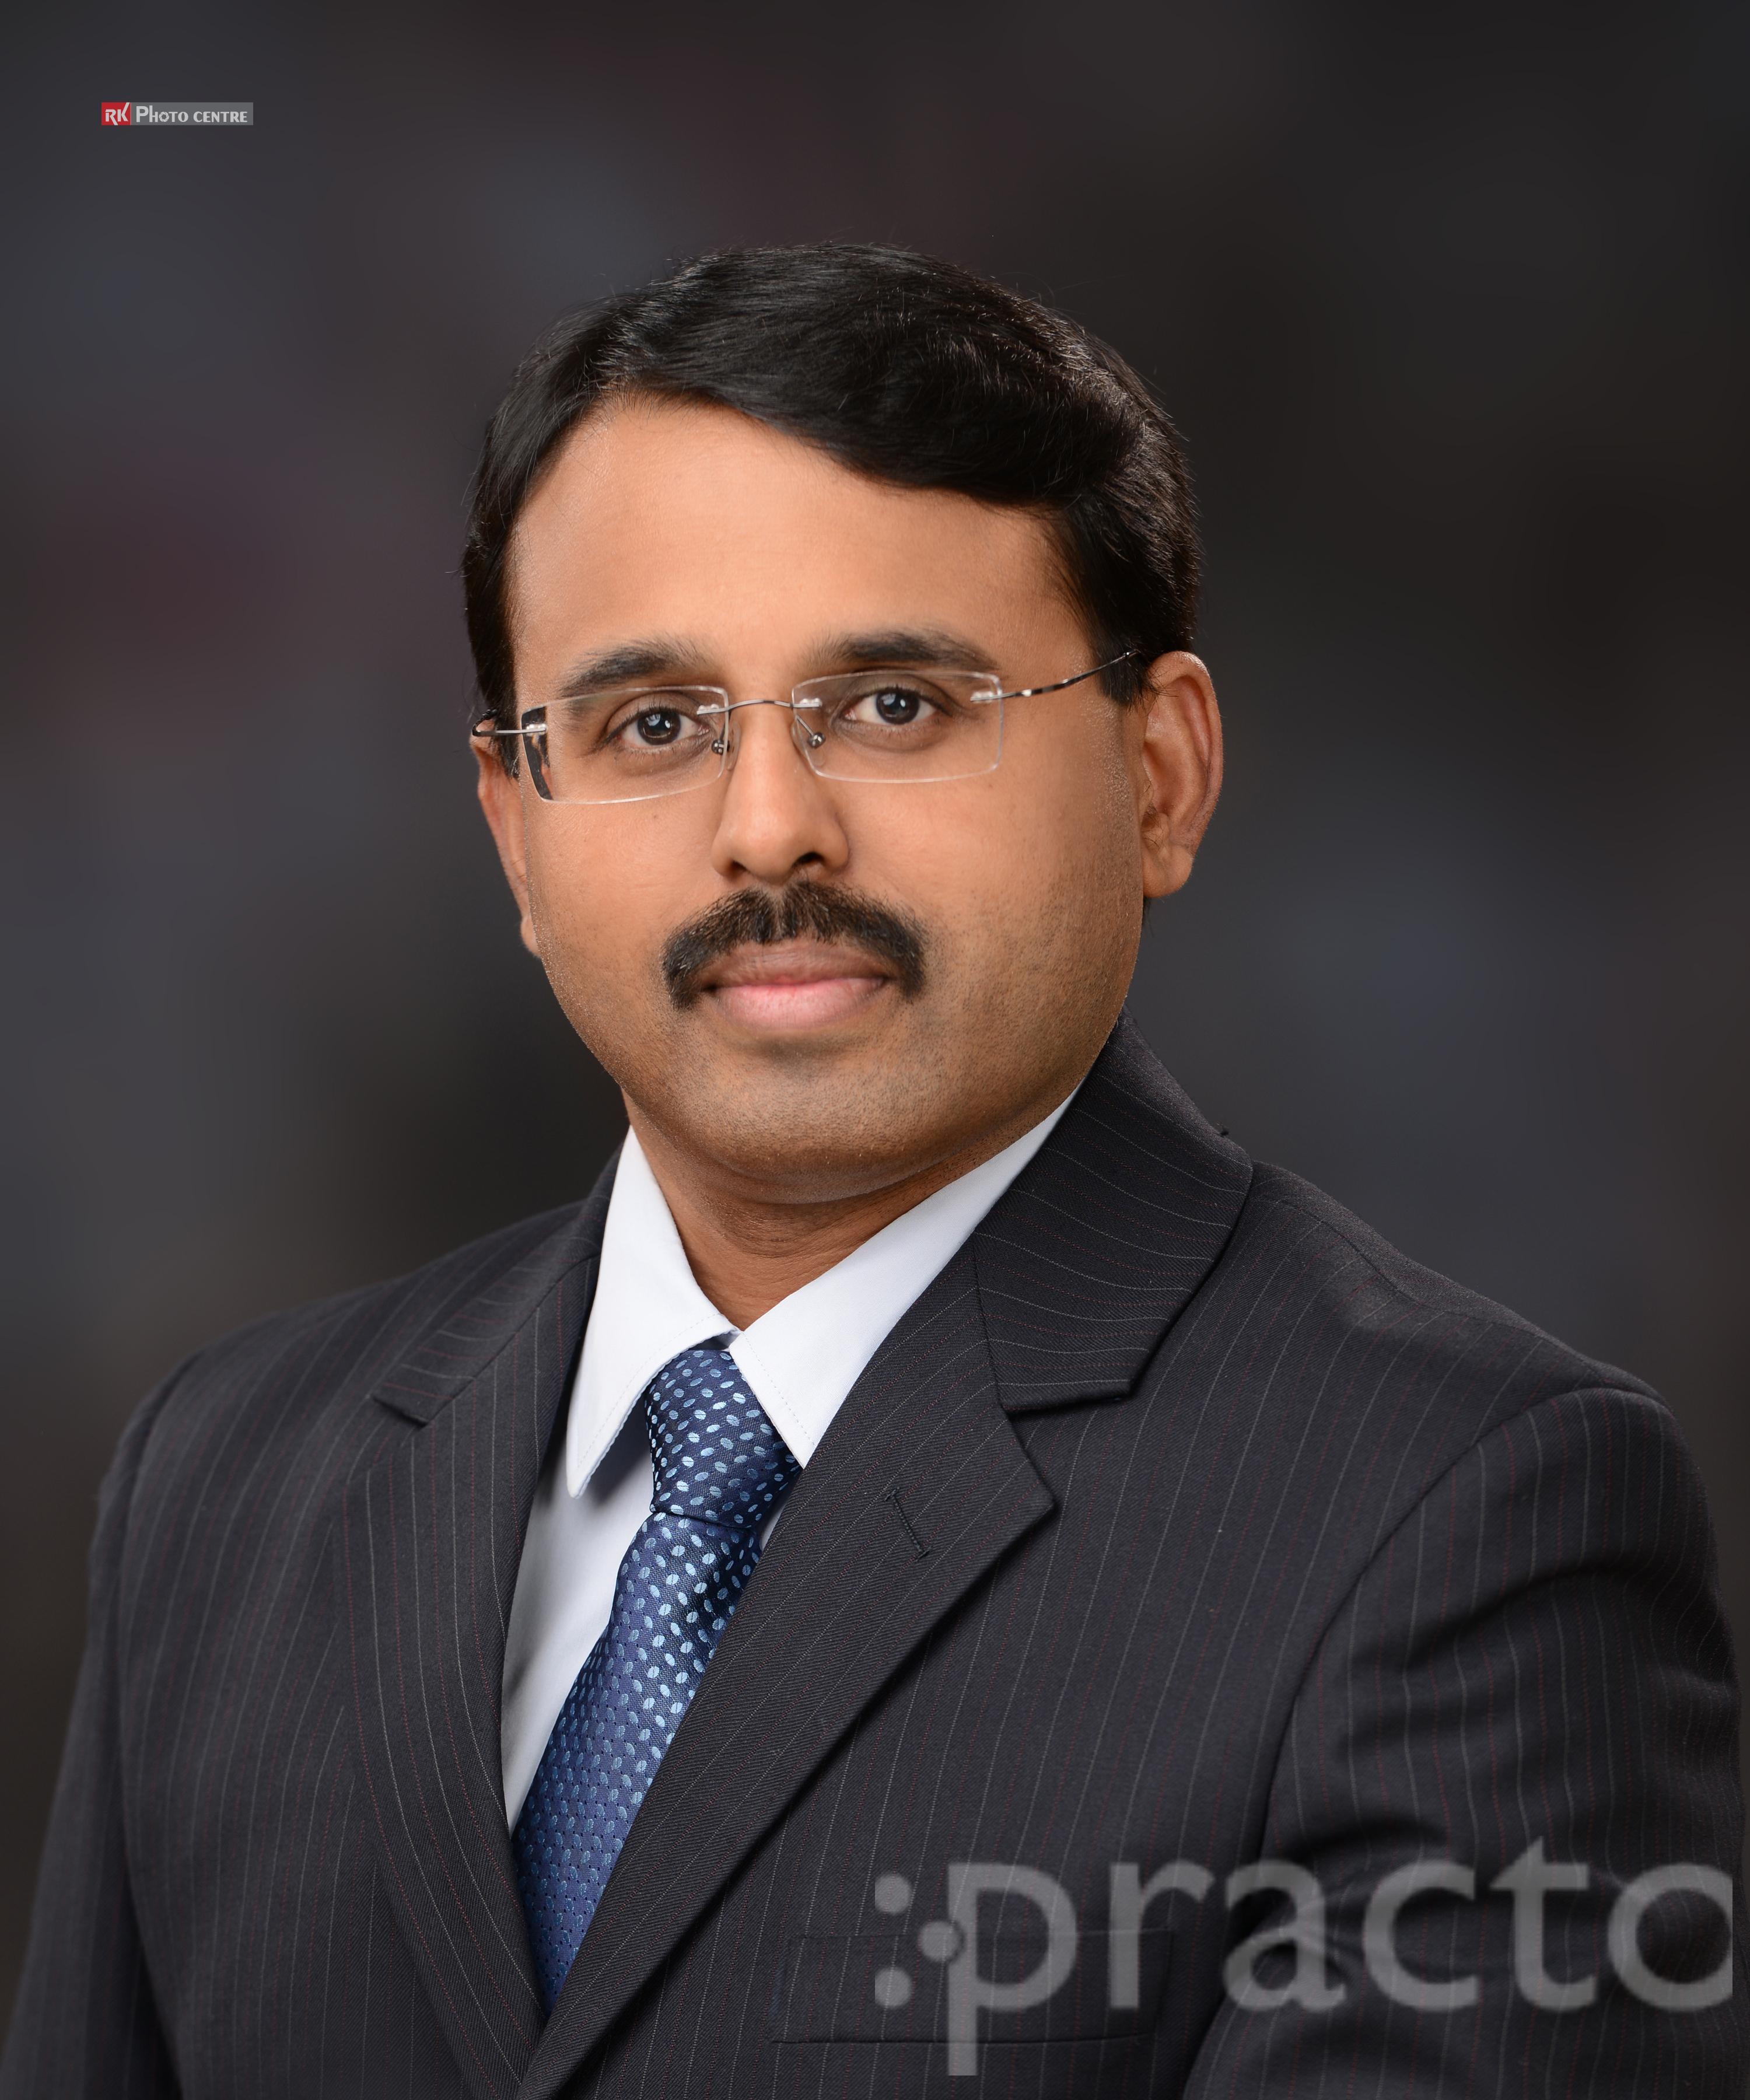 Dr. N.Sathian - Ophthalmologist